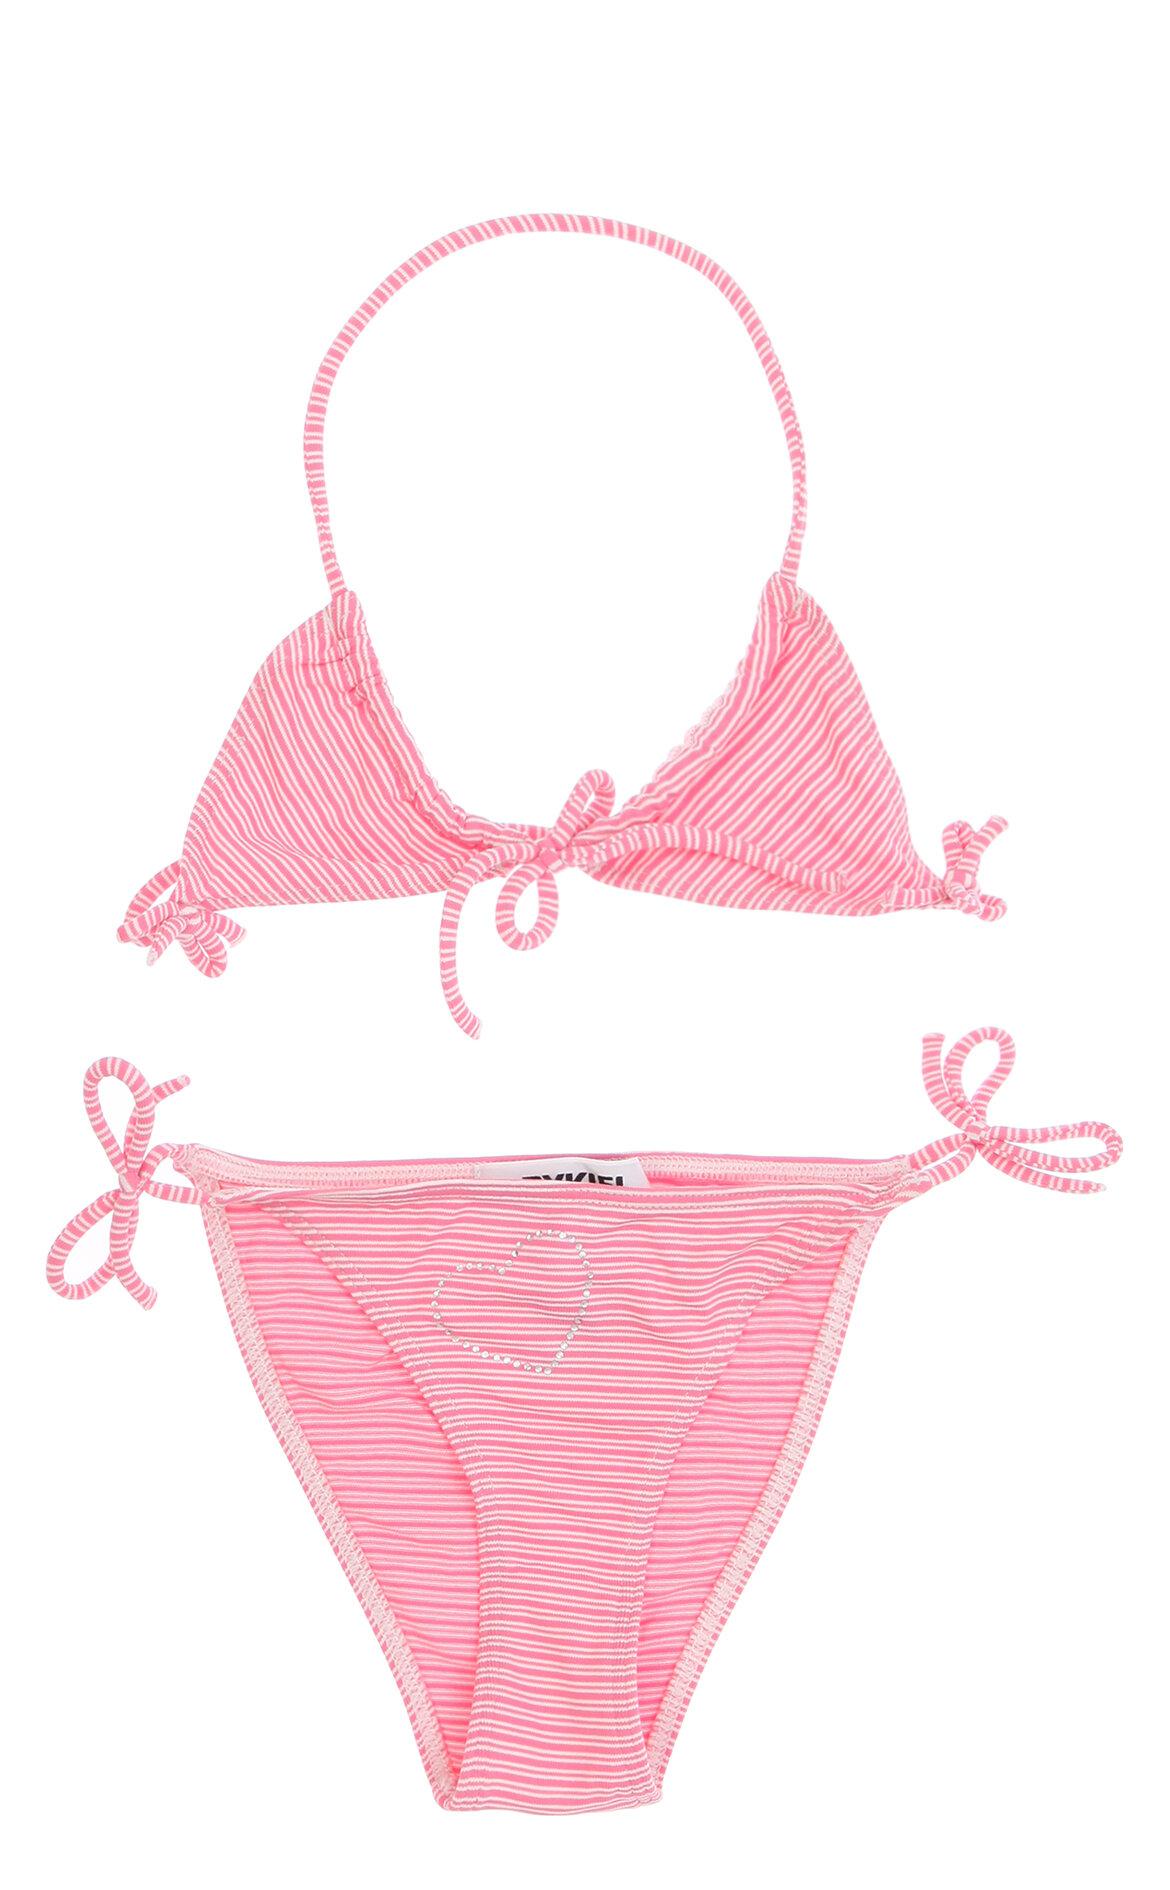 Sonia Rykiel-Sonia Rykiel Kız Çocuk Bikini